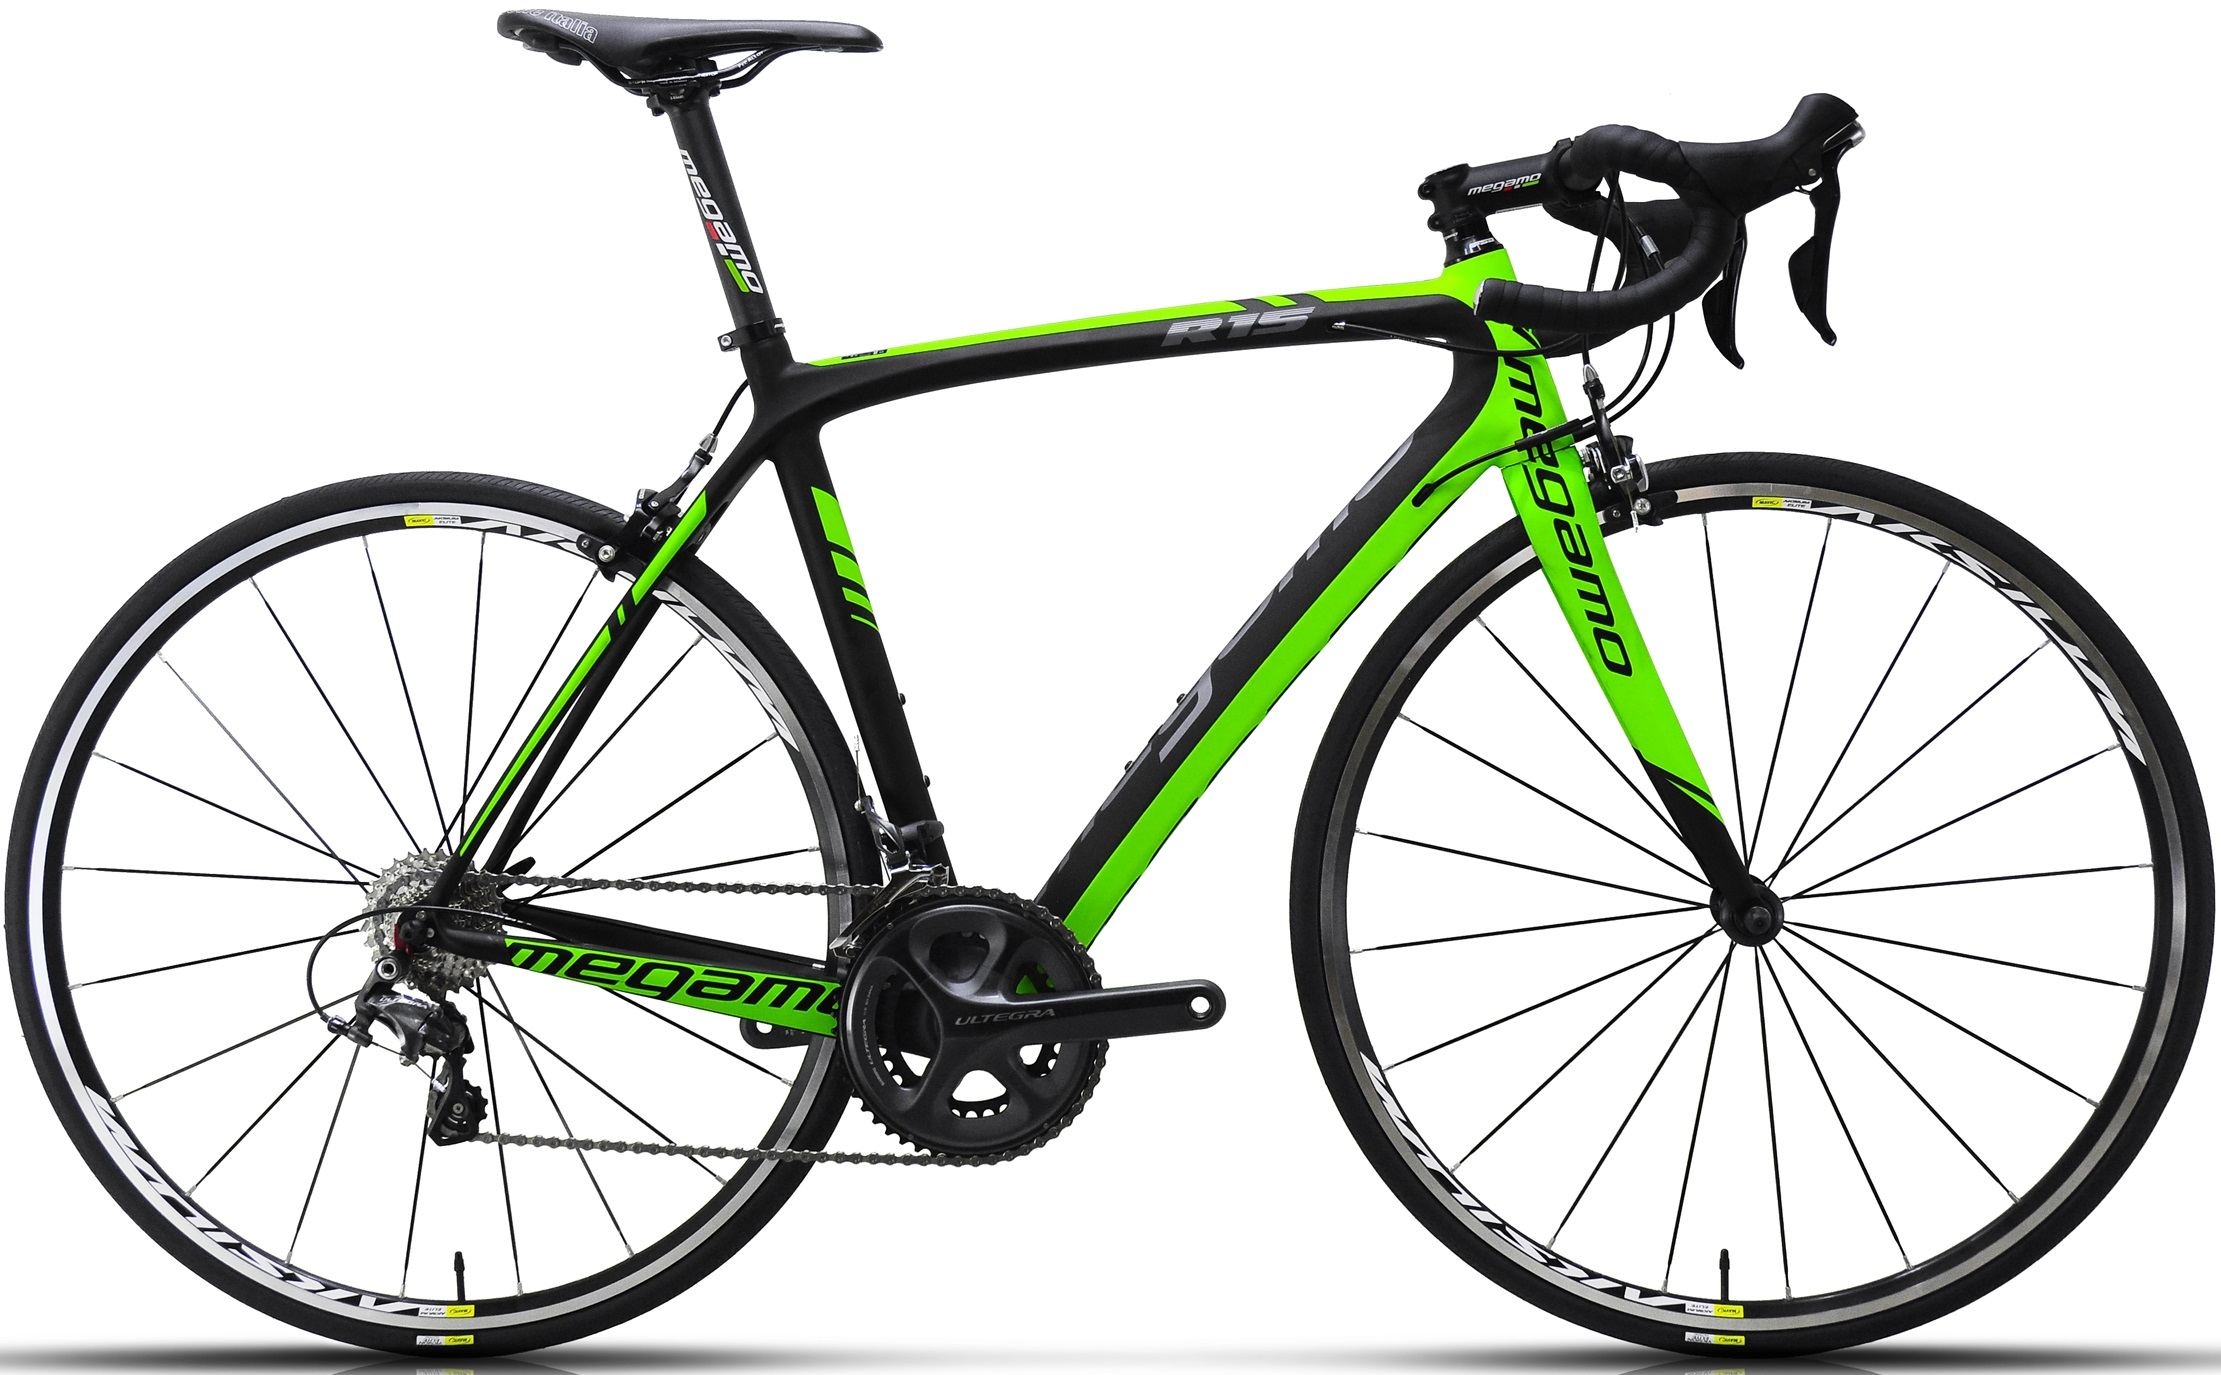 2016 Megamo R15 green ultegraneuroticarnutz2016 Megamo R15 green ultegra2015 Prestigio MT15 green lime yellow ultegra